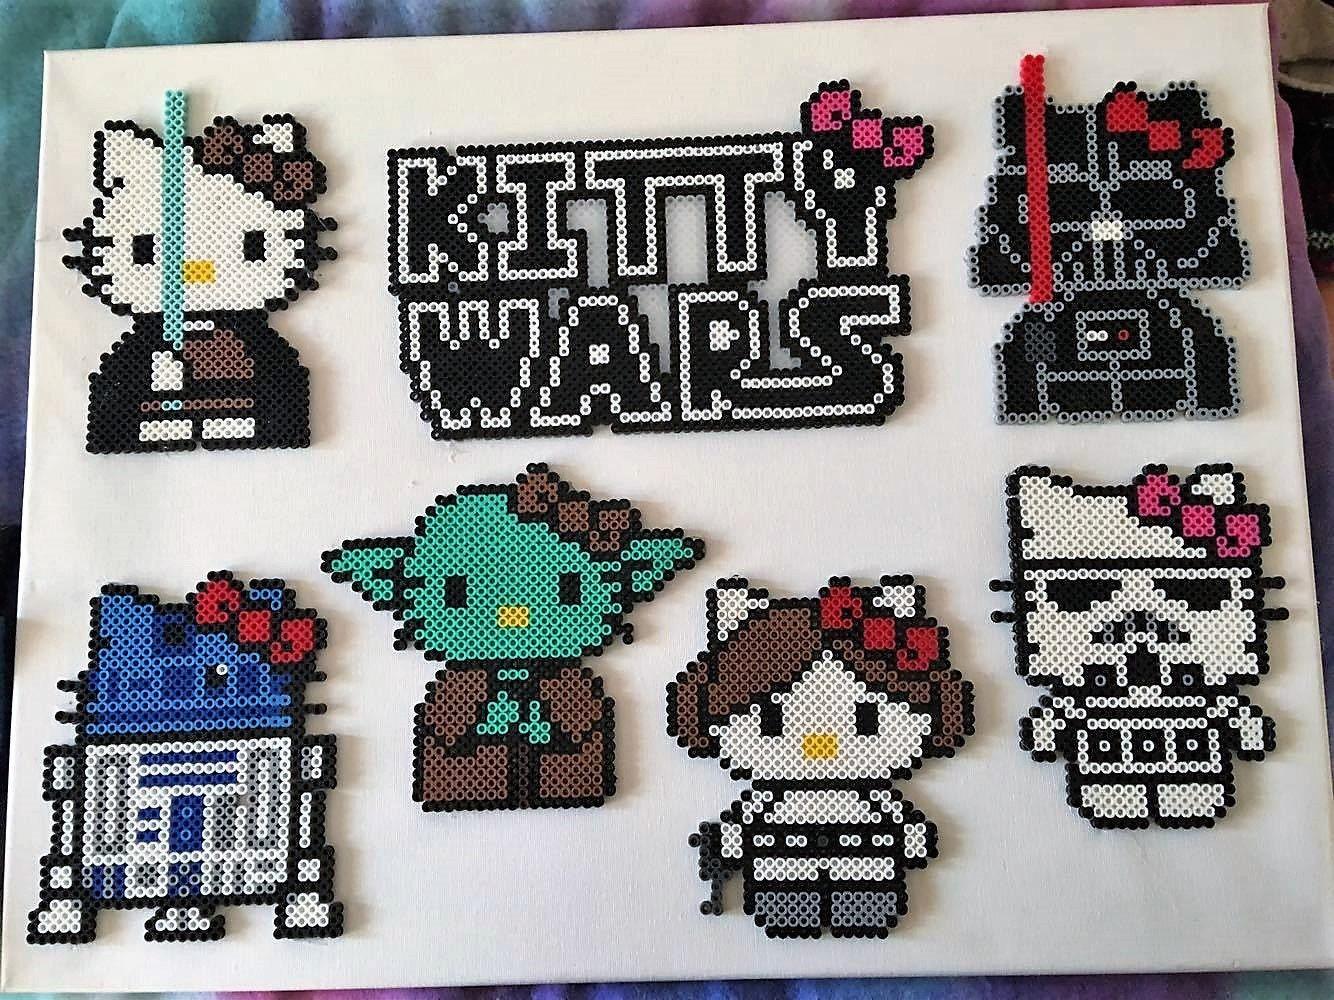 Design your own hello kitty t-shirt - Star Wars Kitty Wars Perler Bead Art